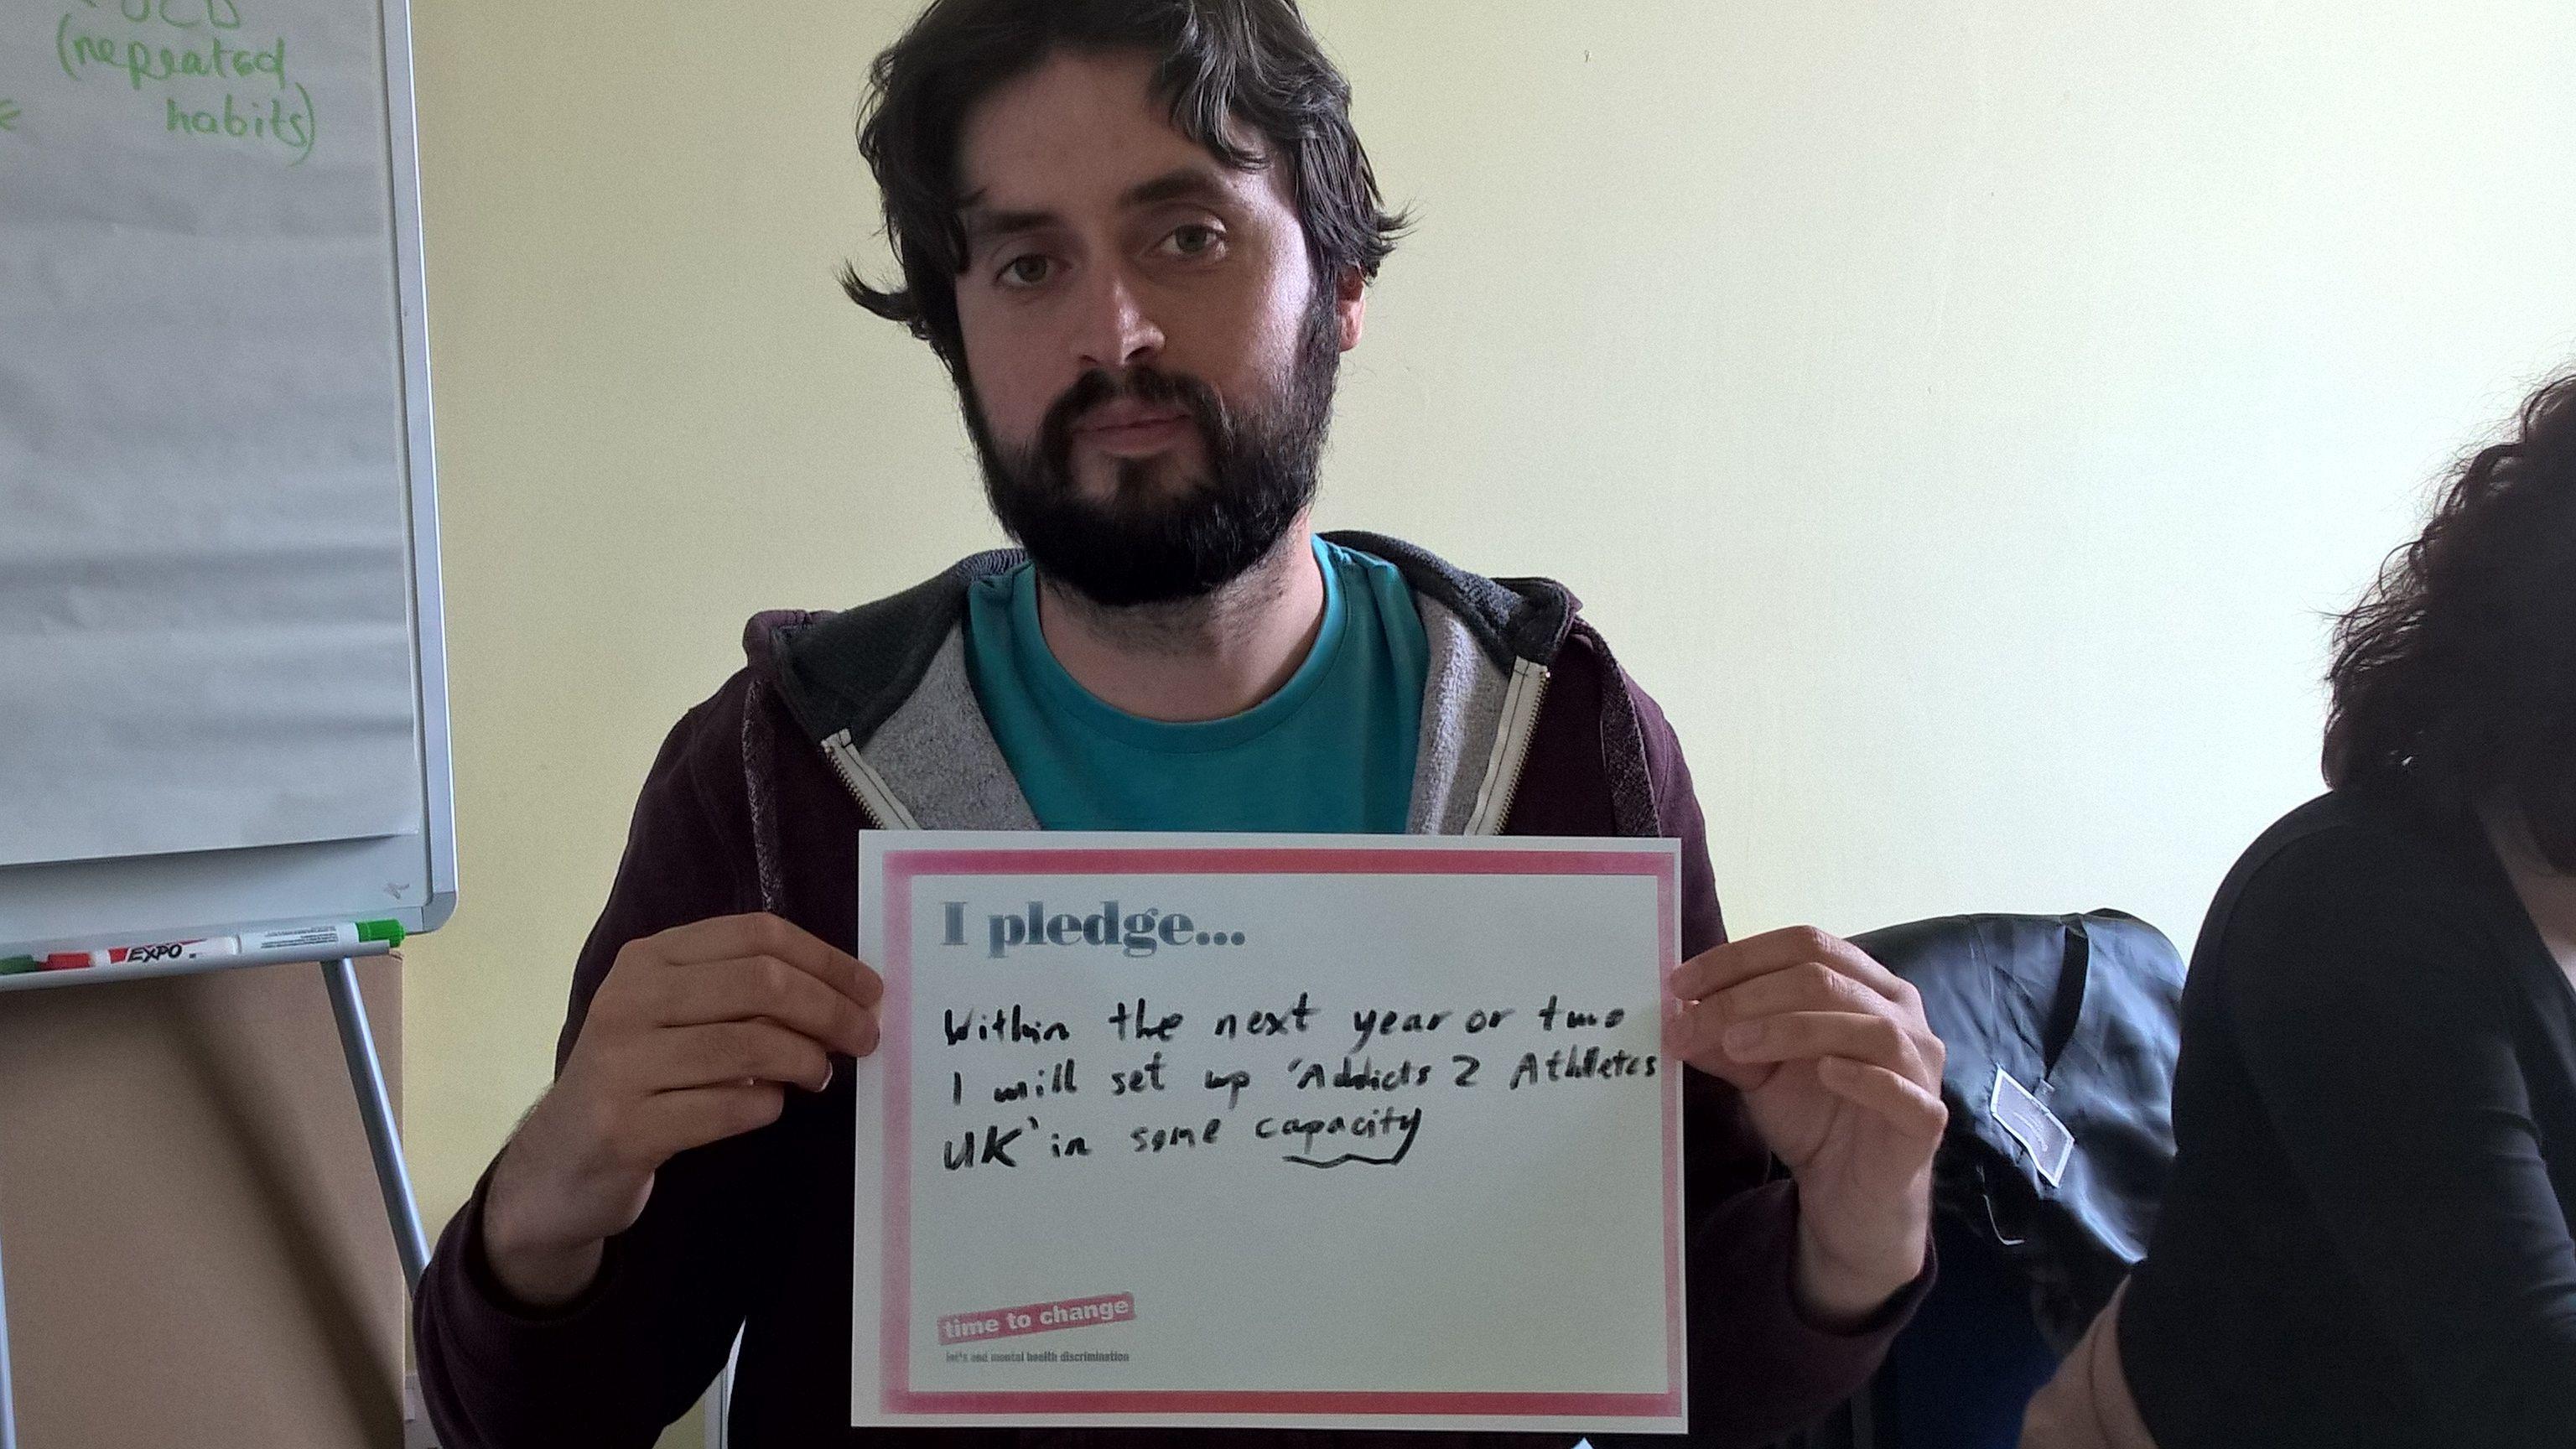 Dave's Pledge